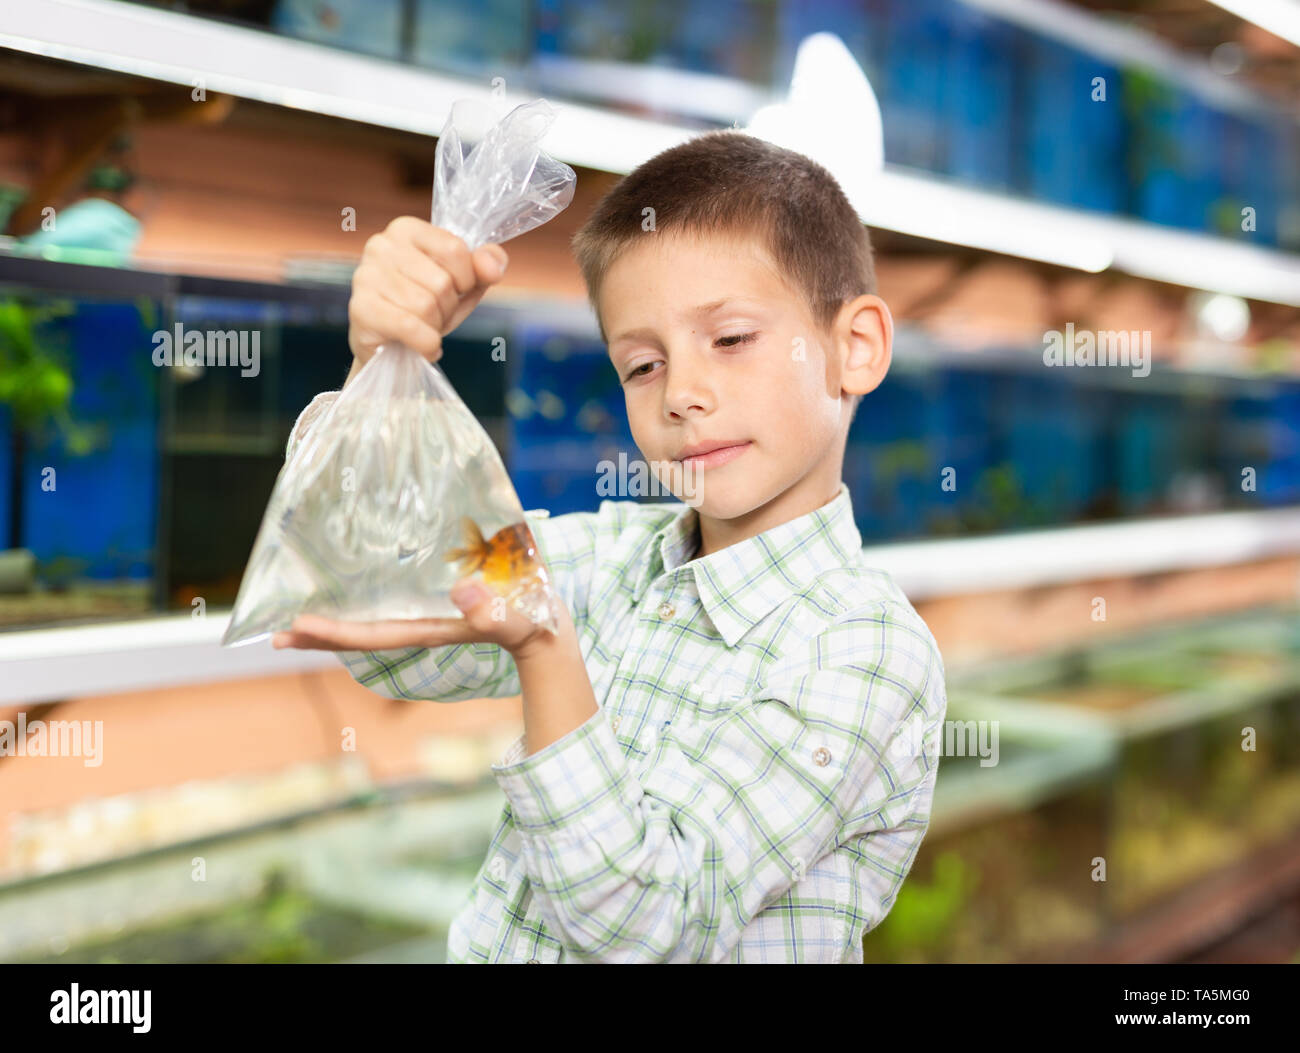 Portrait of happy cute preteen boy with goldfish for home aquarium in petshop - Stock Image